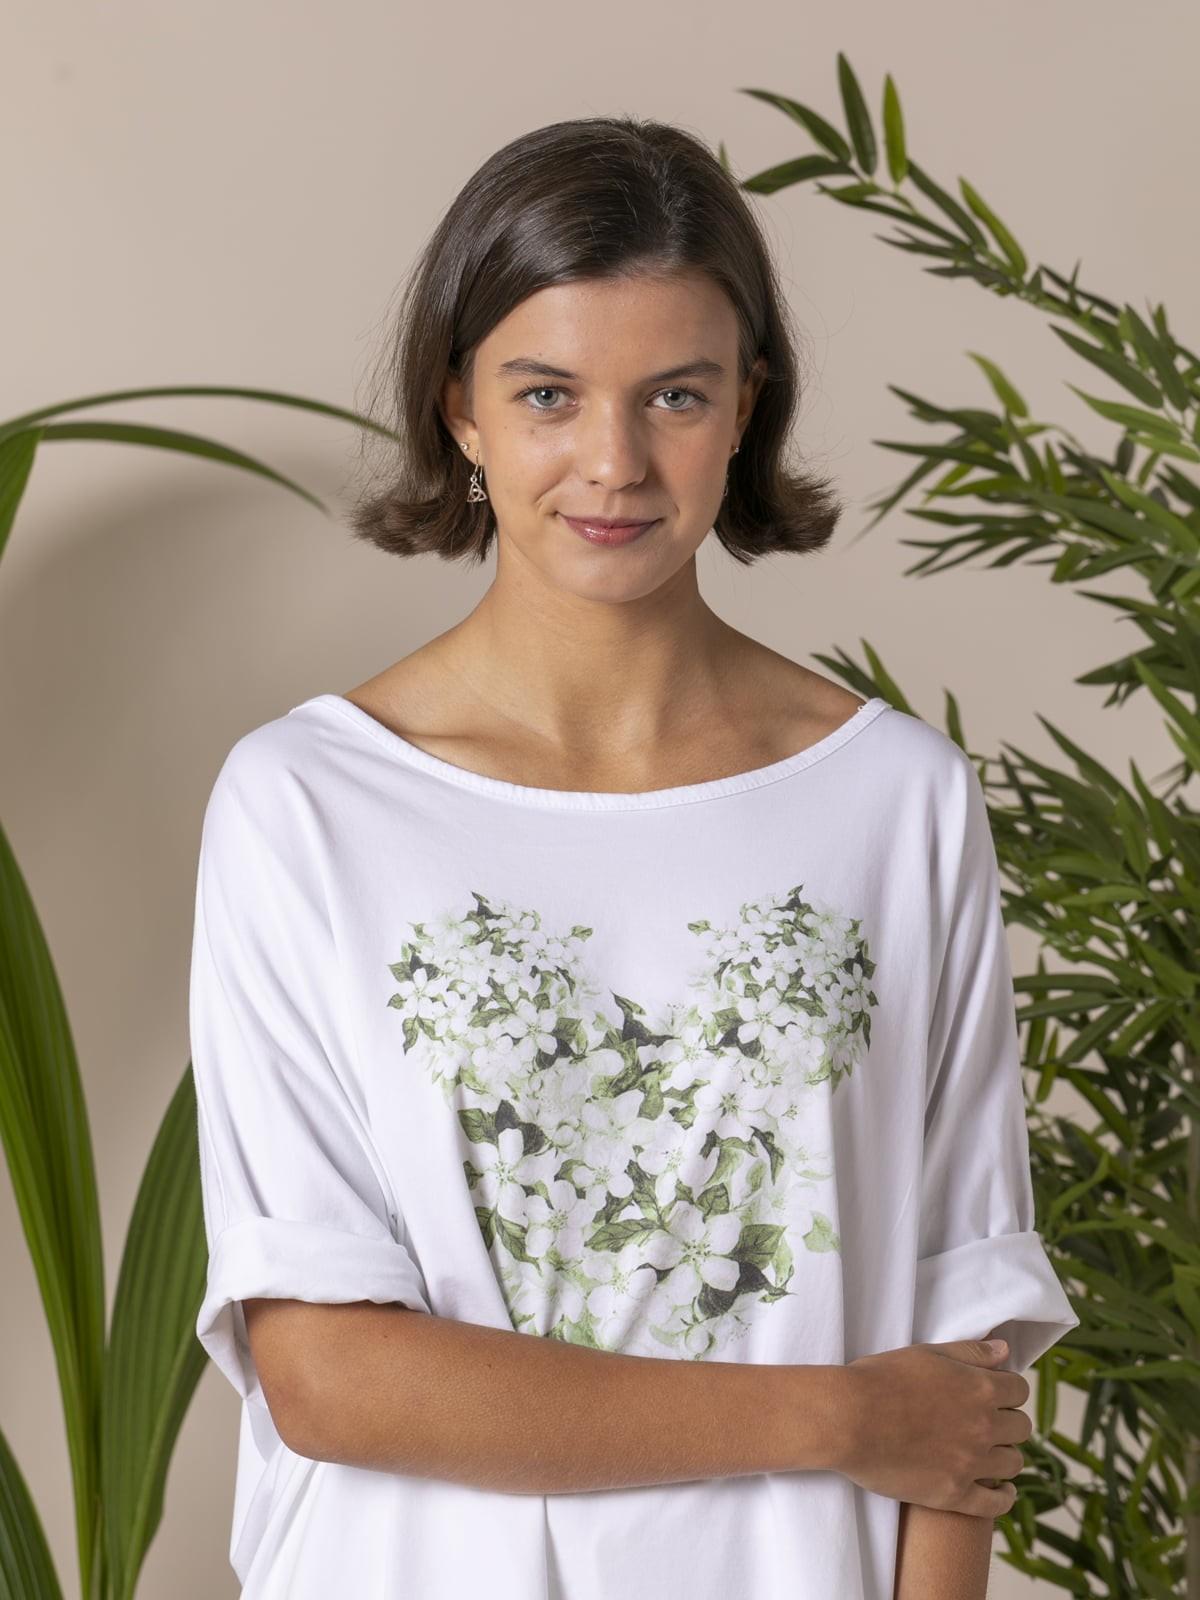 Woman Woman Floral Teddy T-shirt Green